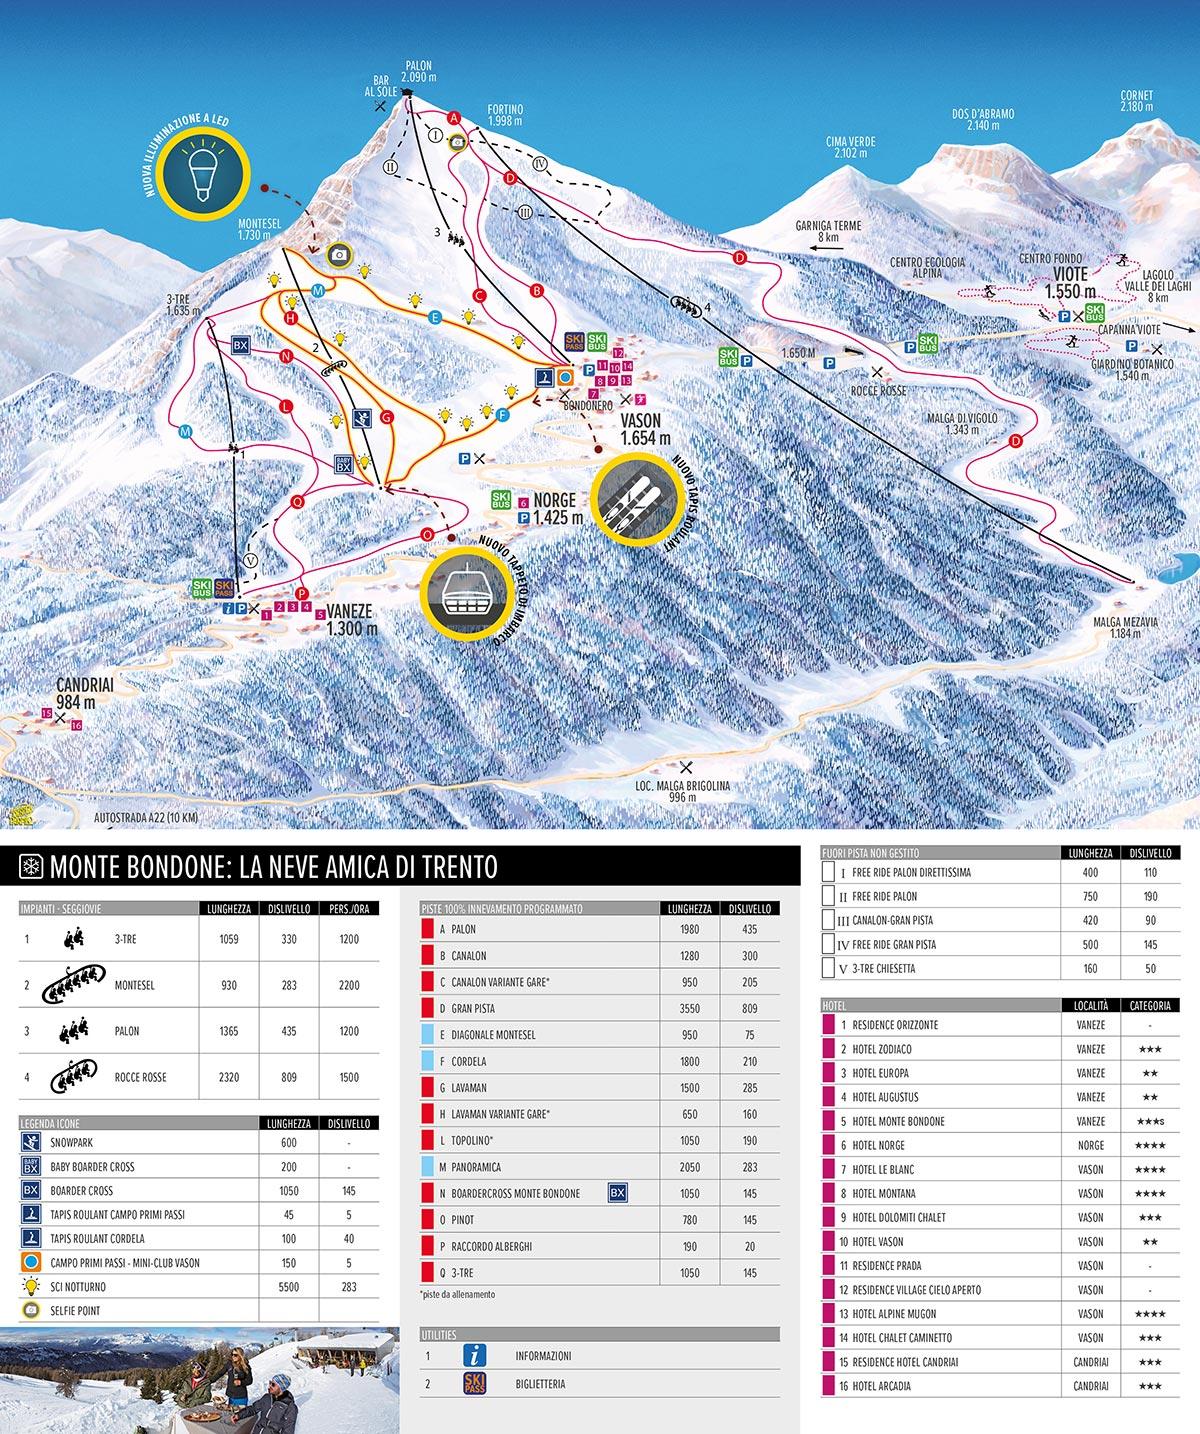 Monte Bondone - Ski-map